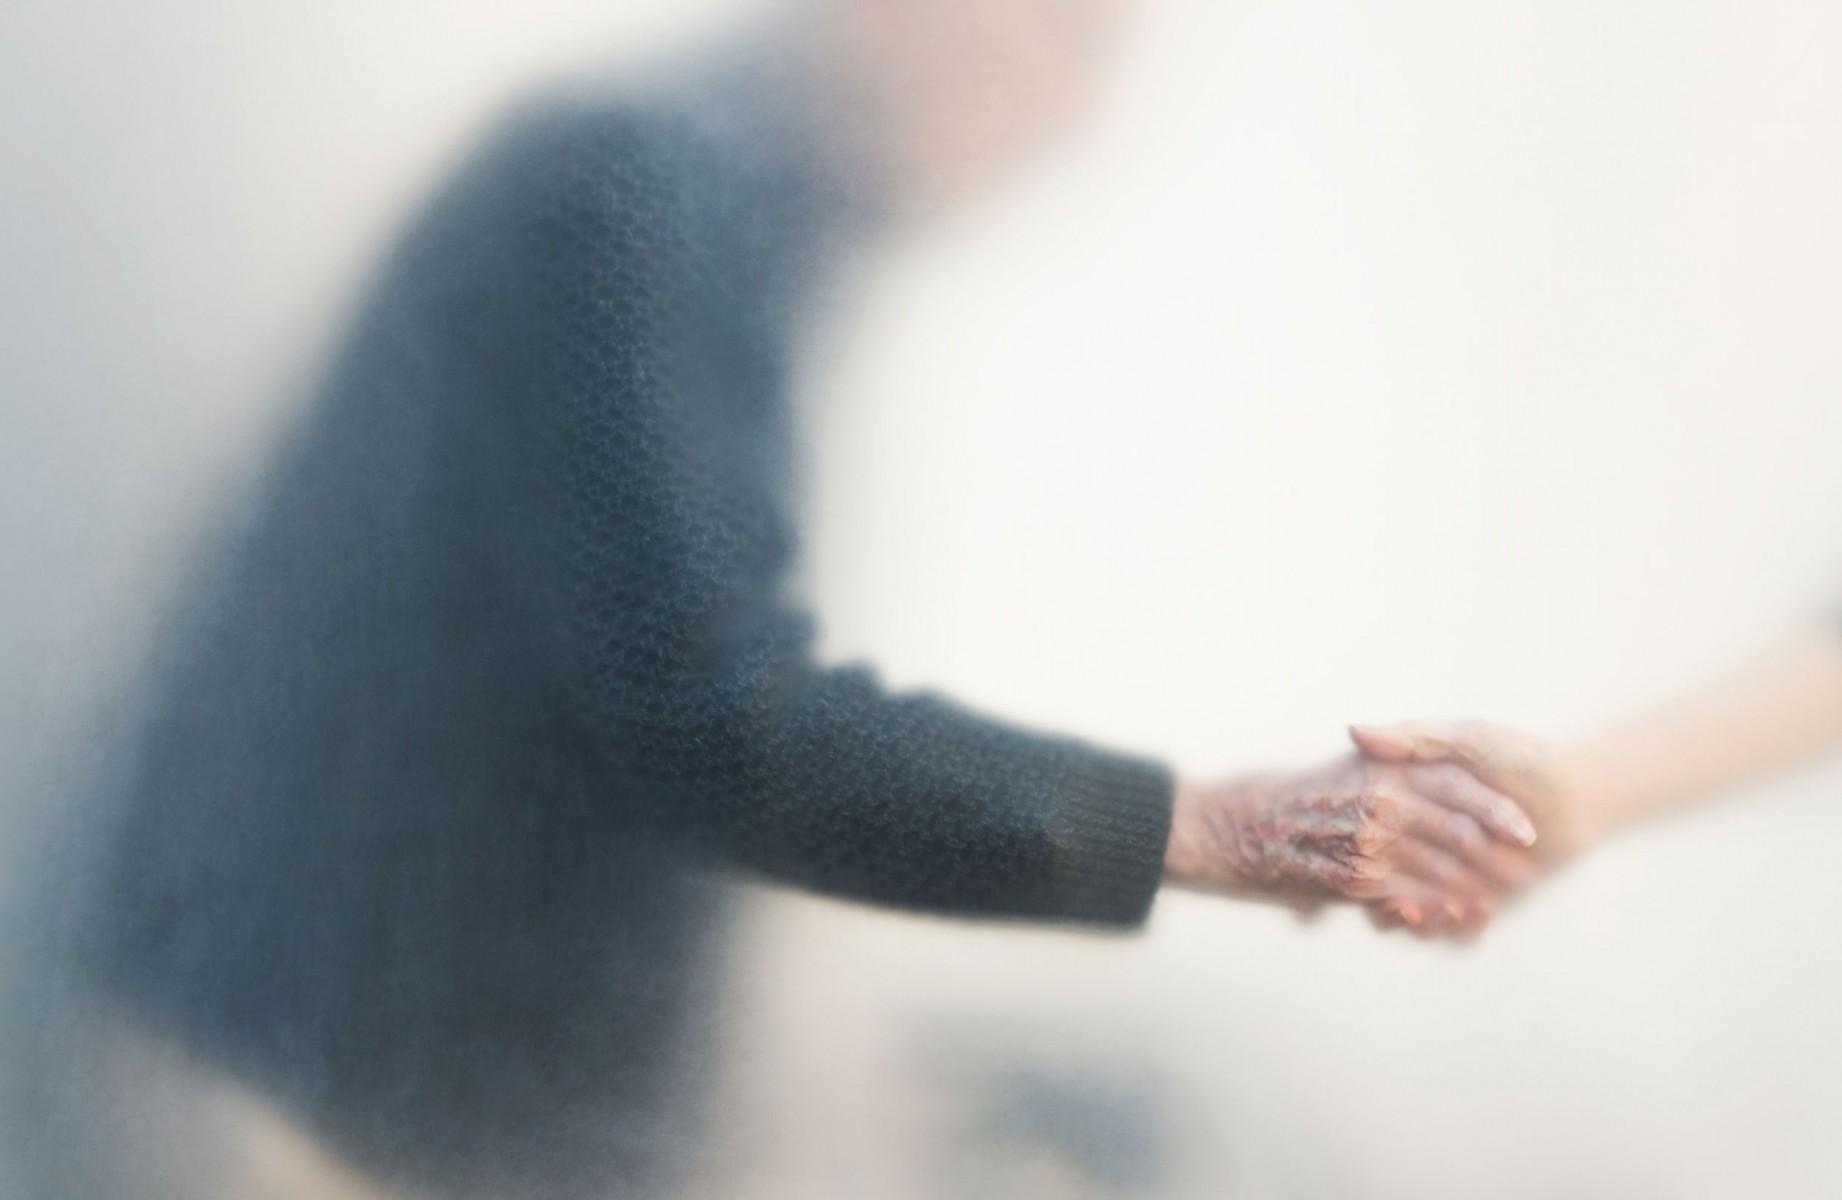 A man shaking hands